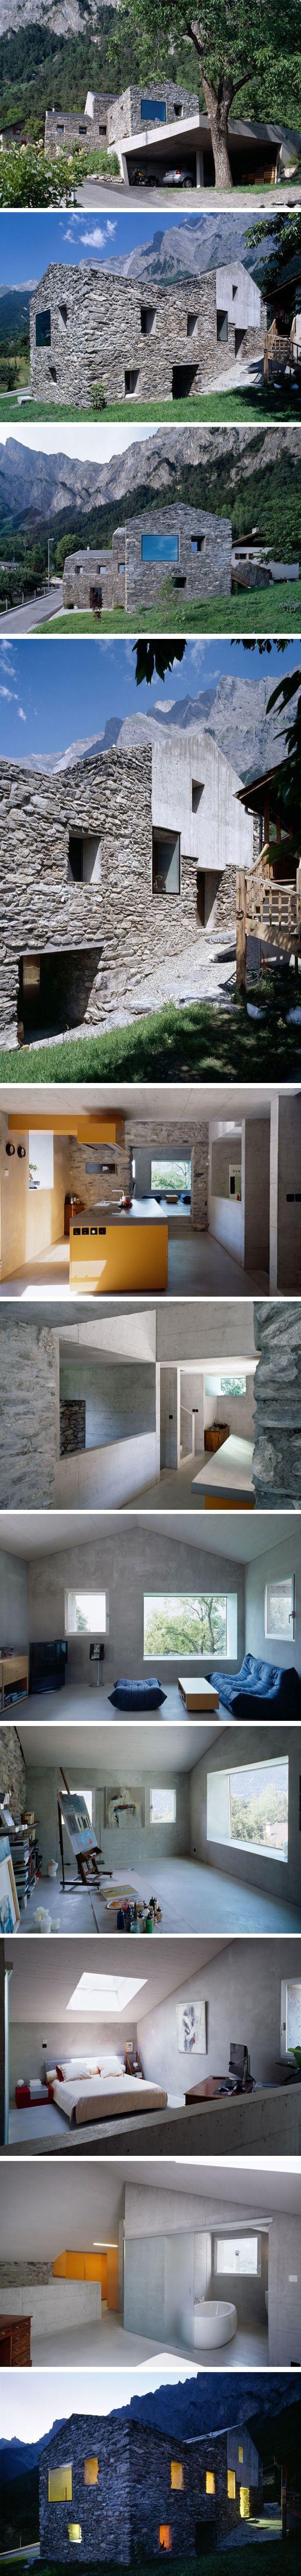 Rénovation à Chamoson par Savioz Fabrizzi Architecte; the house, the location and the studio. Not the garage.